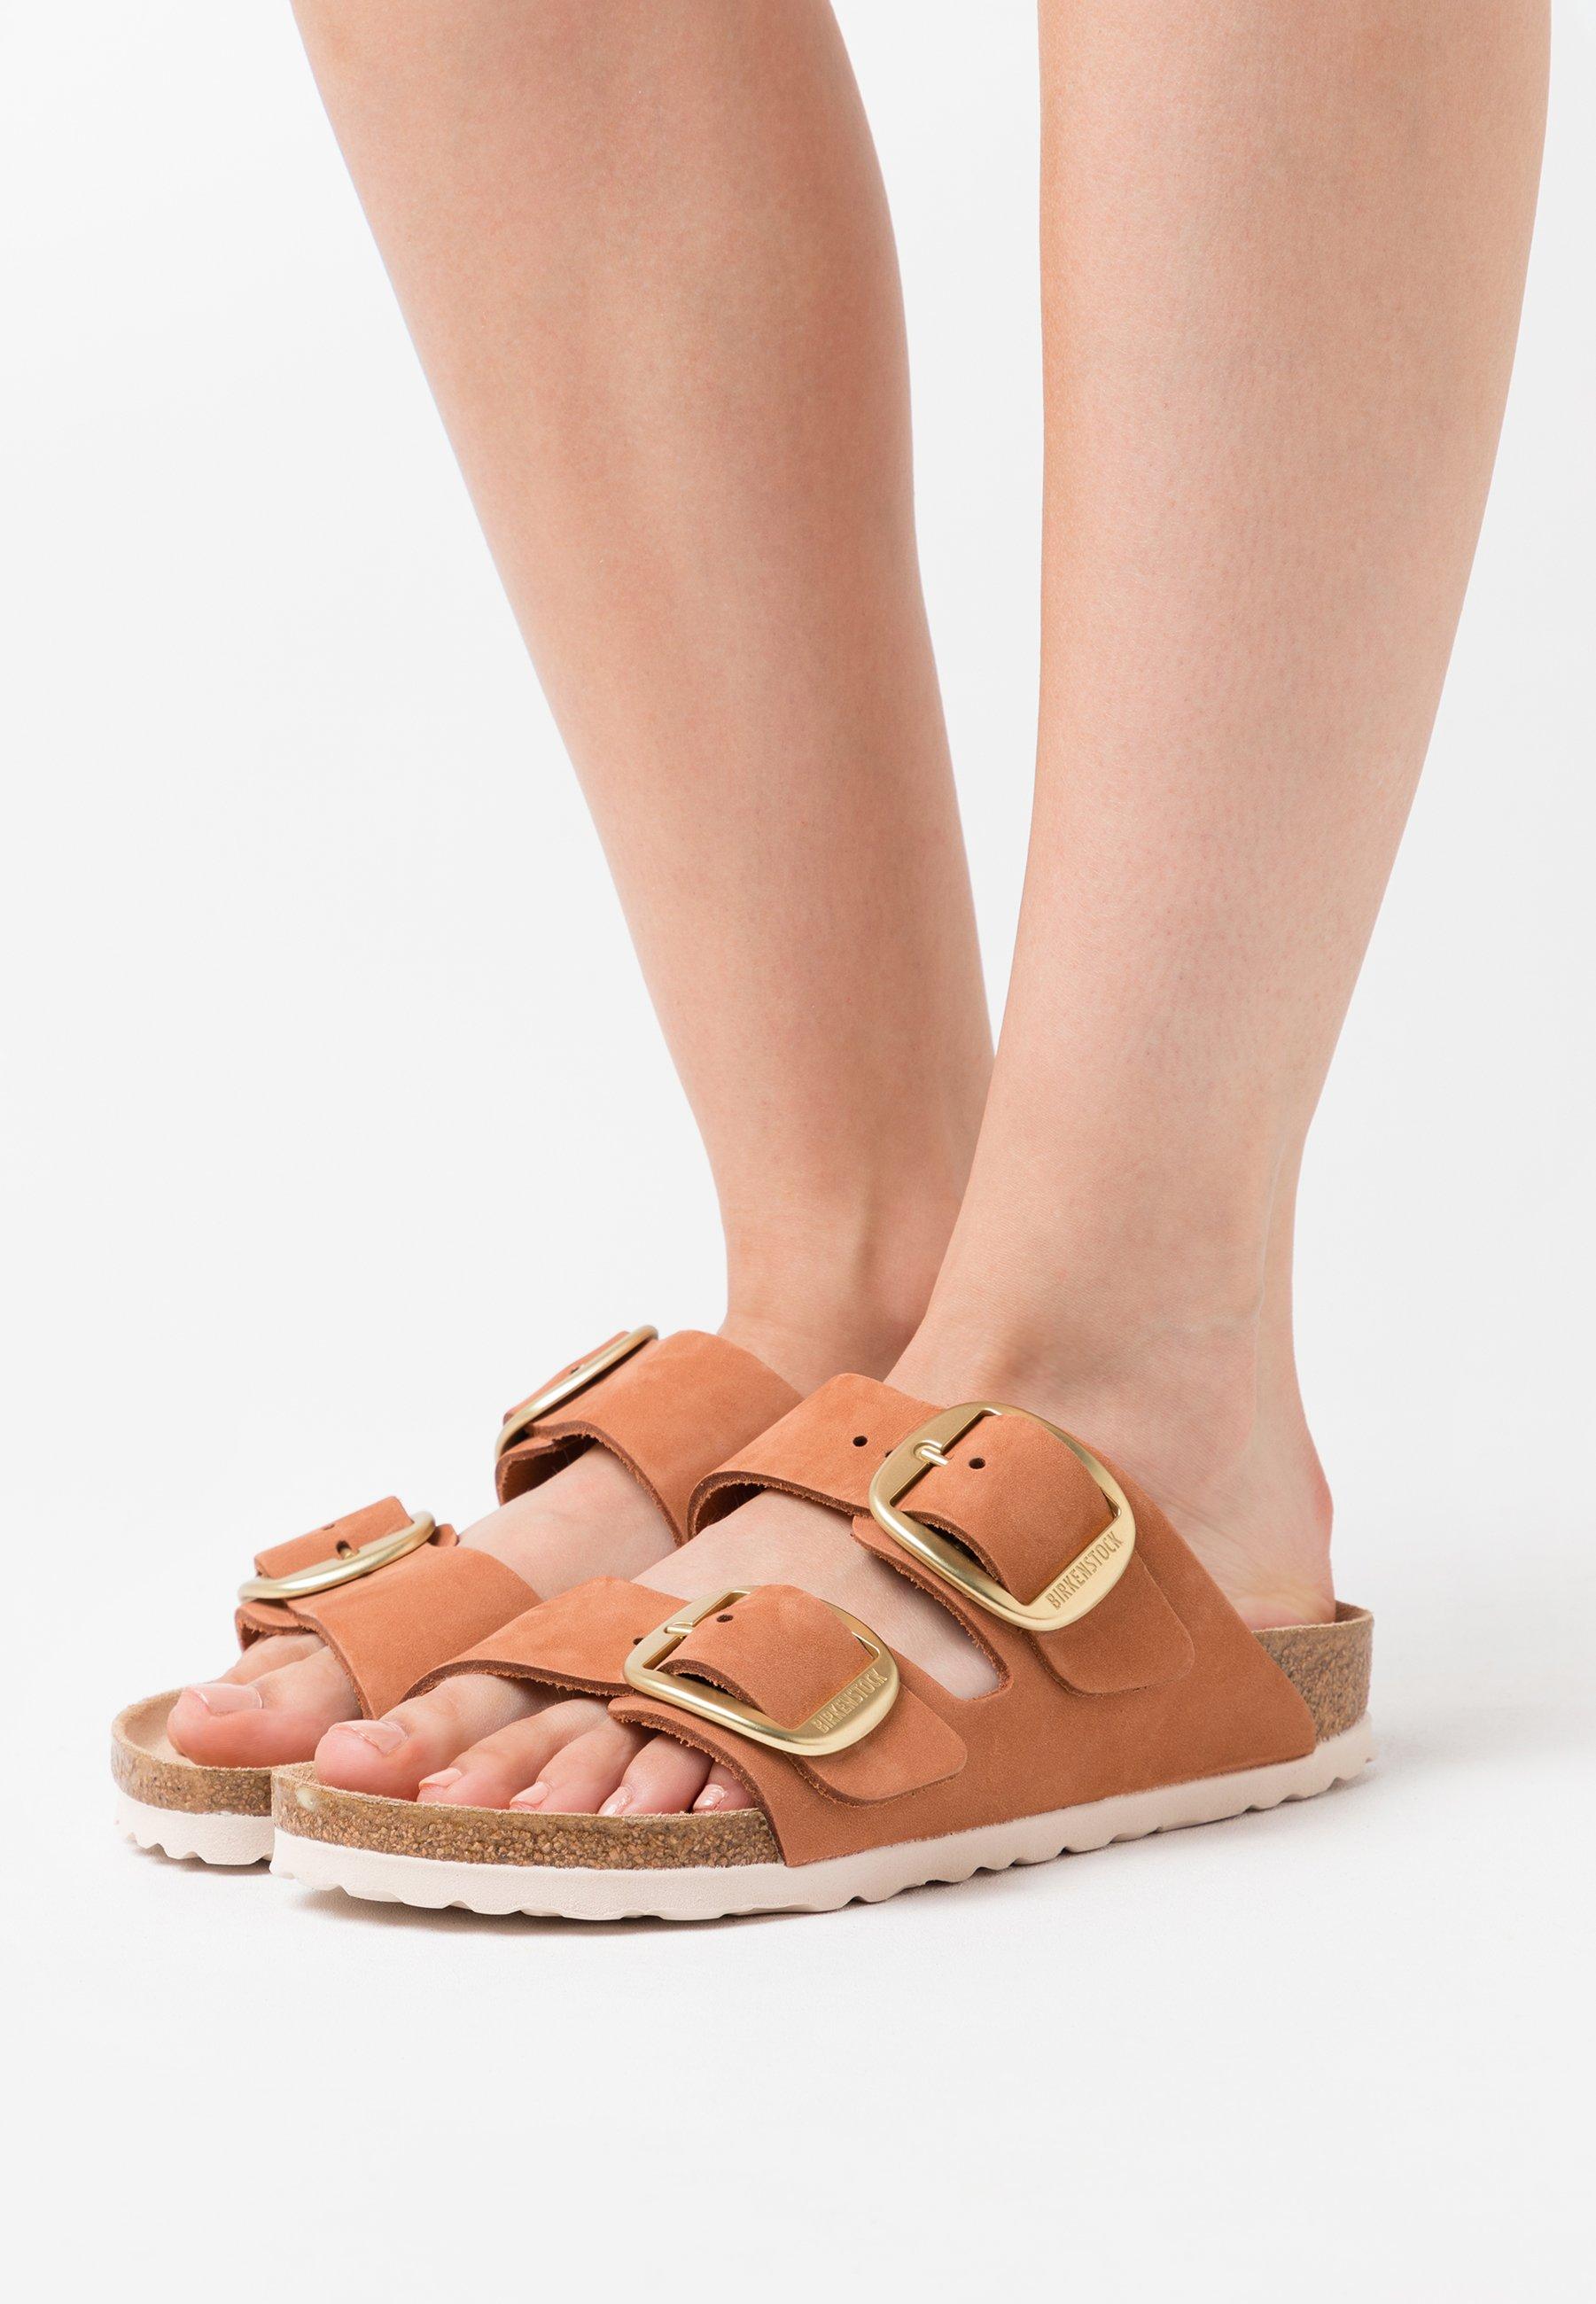 Wholesale Women's Shoes Birkenstock ARIZONA Slippers brandy 7EJRyjSvh